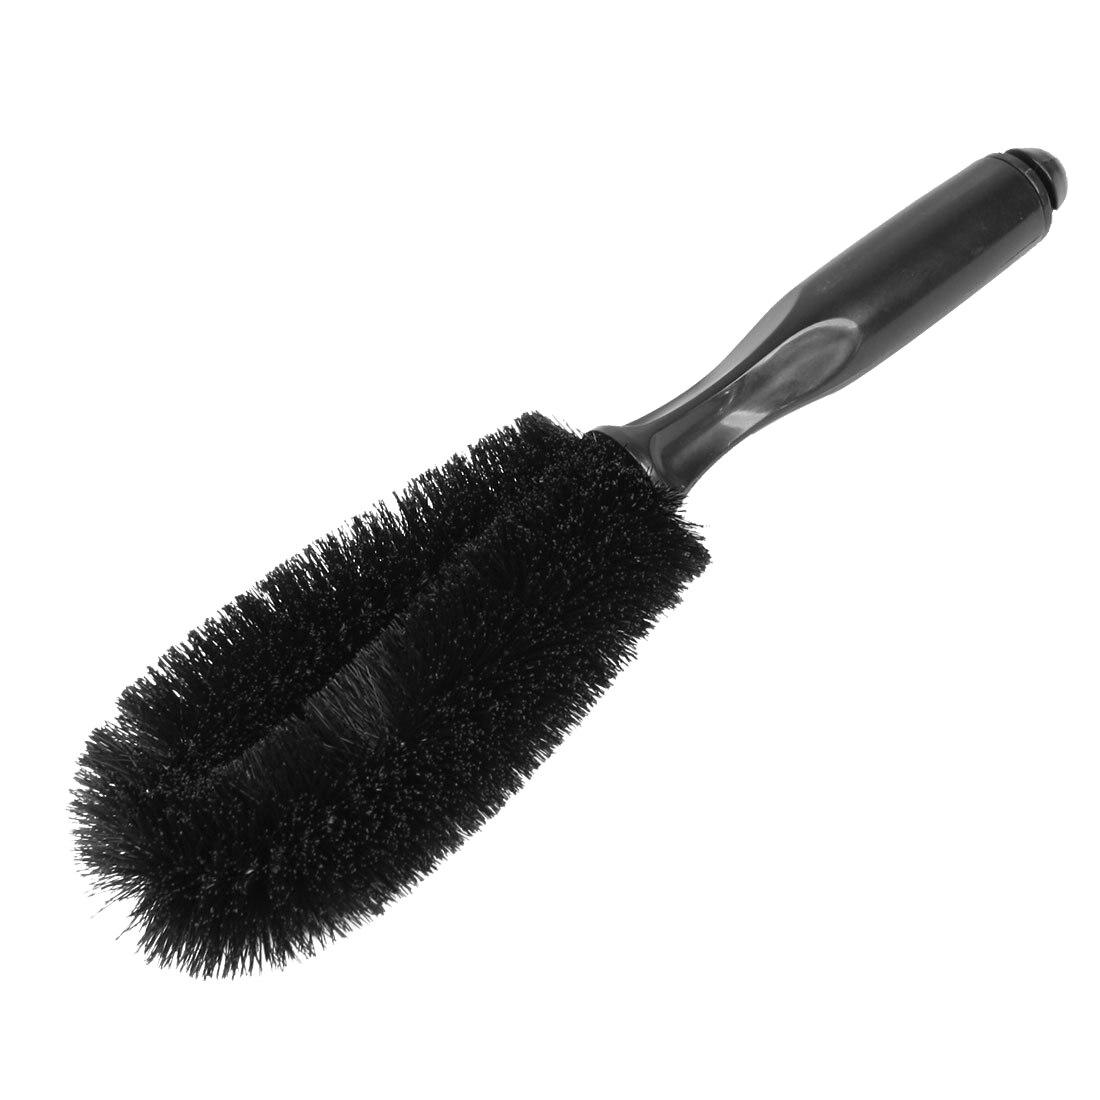 Promotion! Black Truck Car Auto Wheel Tire Rim Brush Wash Cleaning Tool 10.6 Long